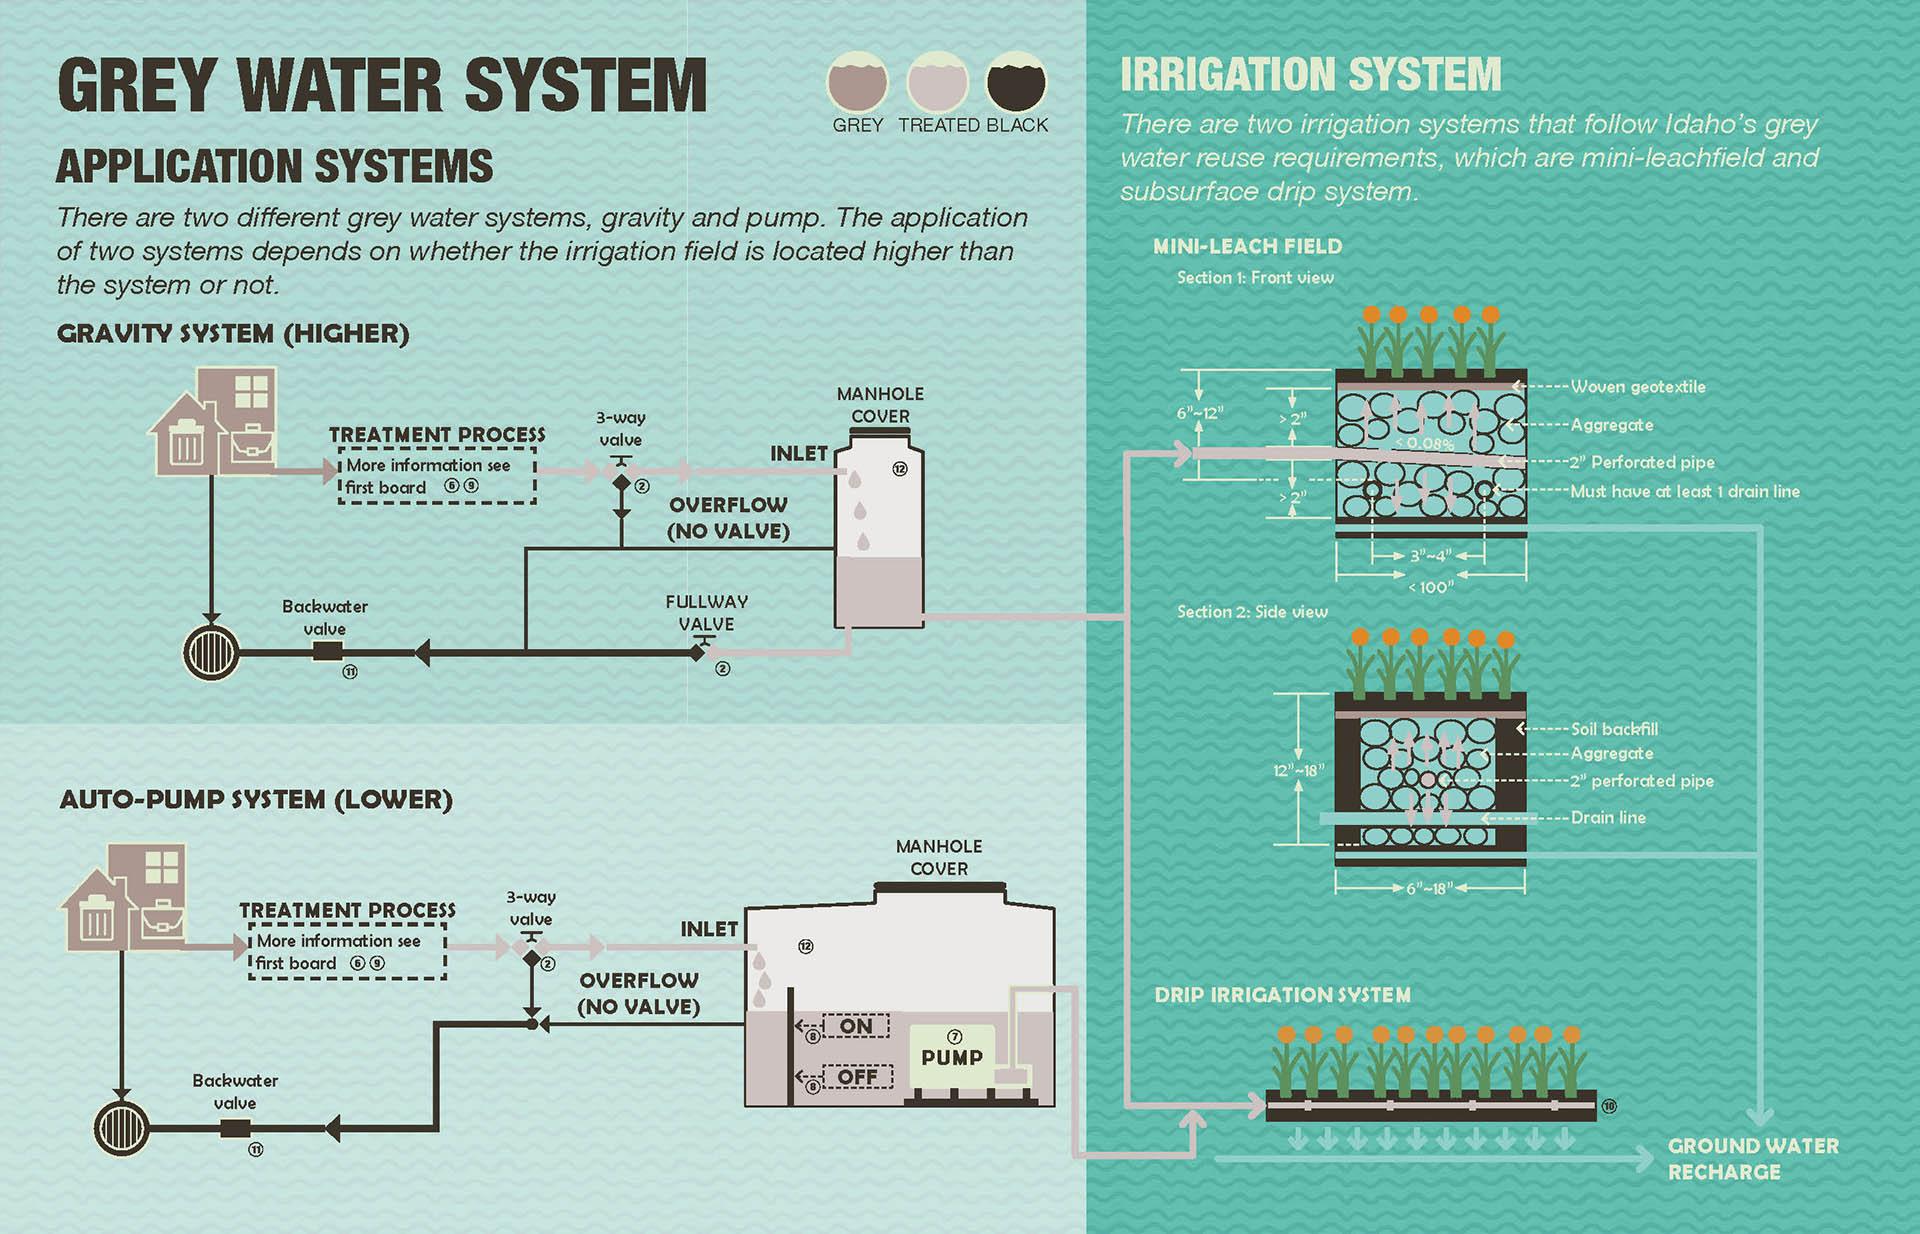 03 Grey Water Application System.jpg